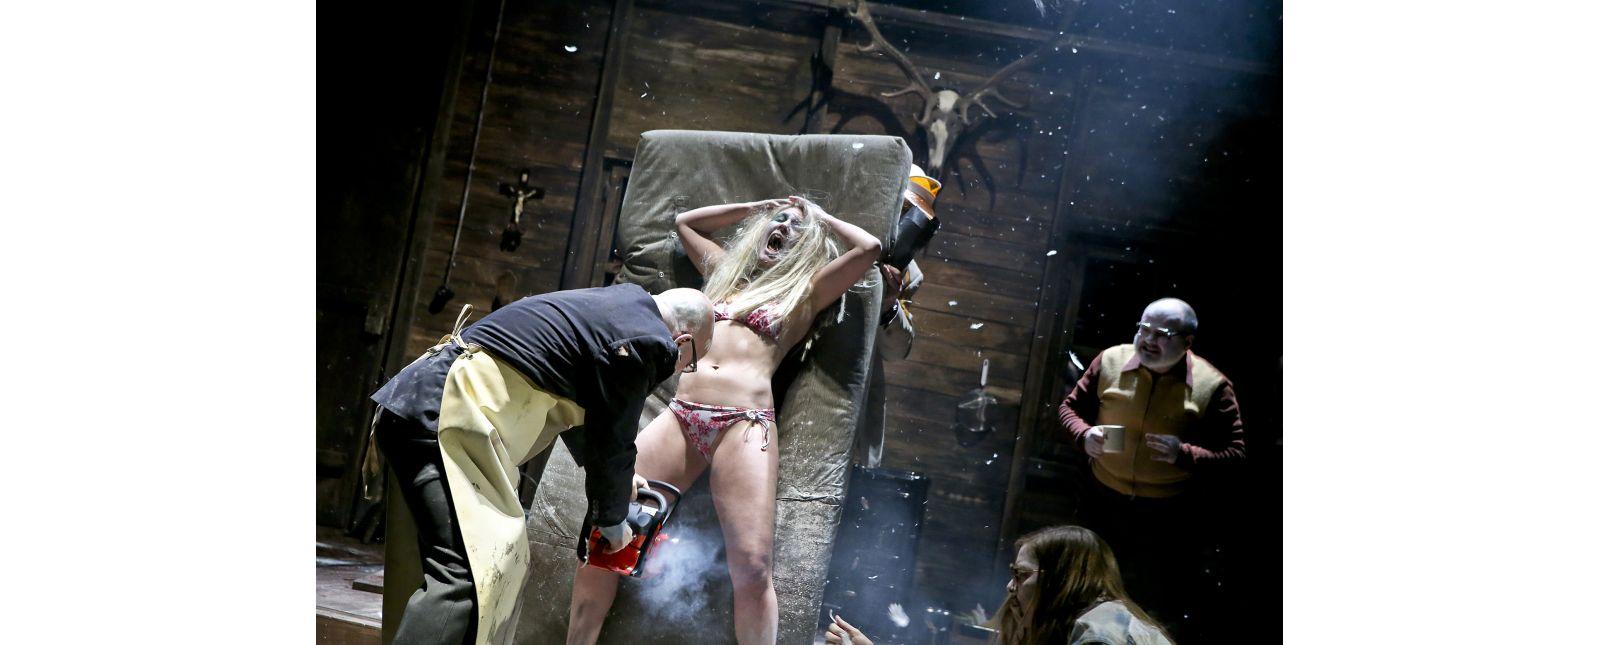 The Black Forest Chainsaw Opera // Holger Kunkel, Janna Horstmann, Chiel Van Berkel, Kirsten Pieters, Roberto Gionfriddo // Birgit Hupfeld // 2018